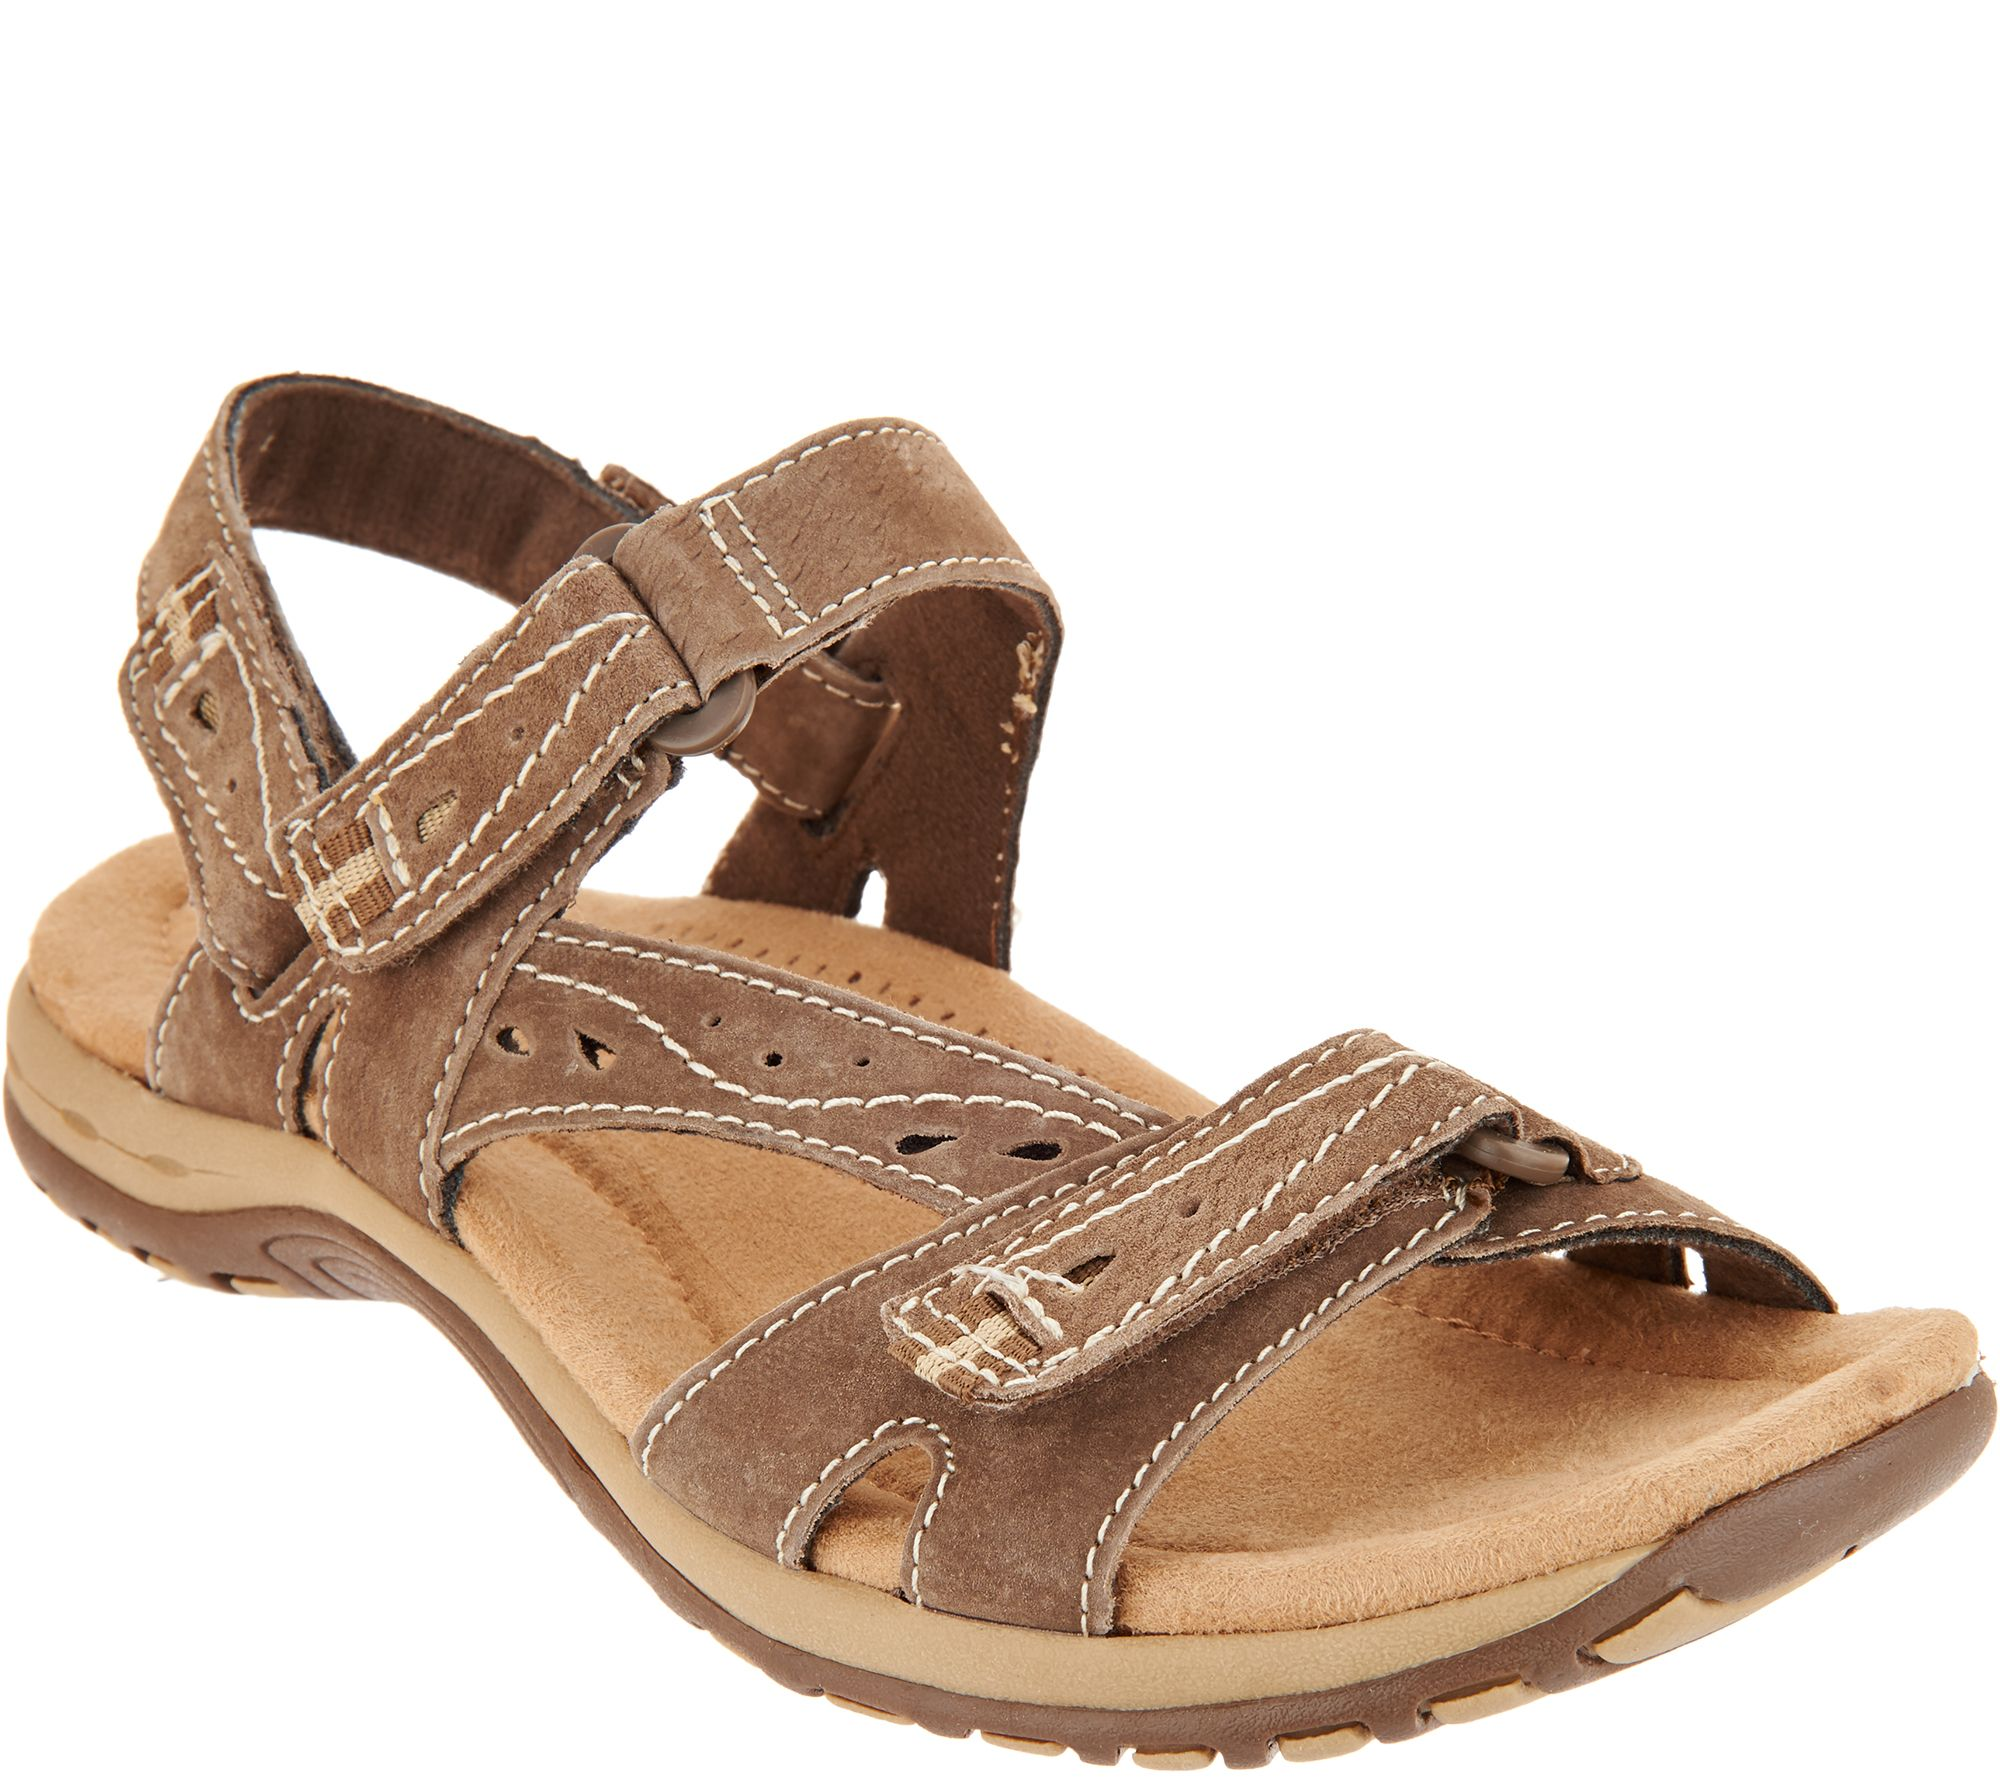 129cee00bb0b Earth Origins Suede Sport Sandals - Sophie — QVC.com